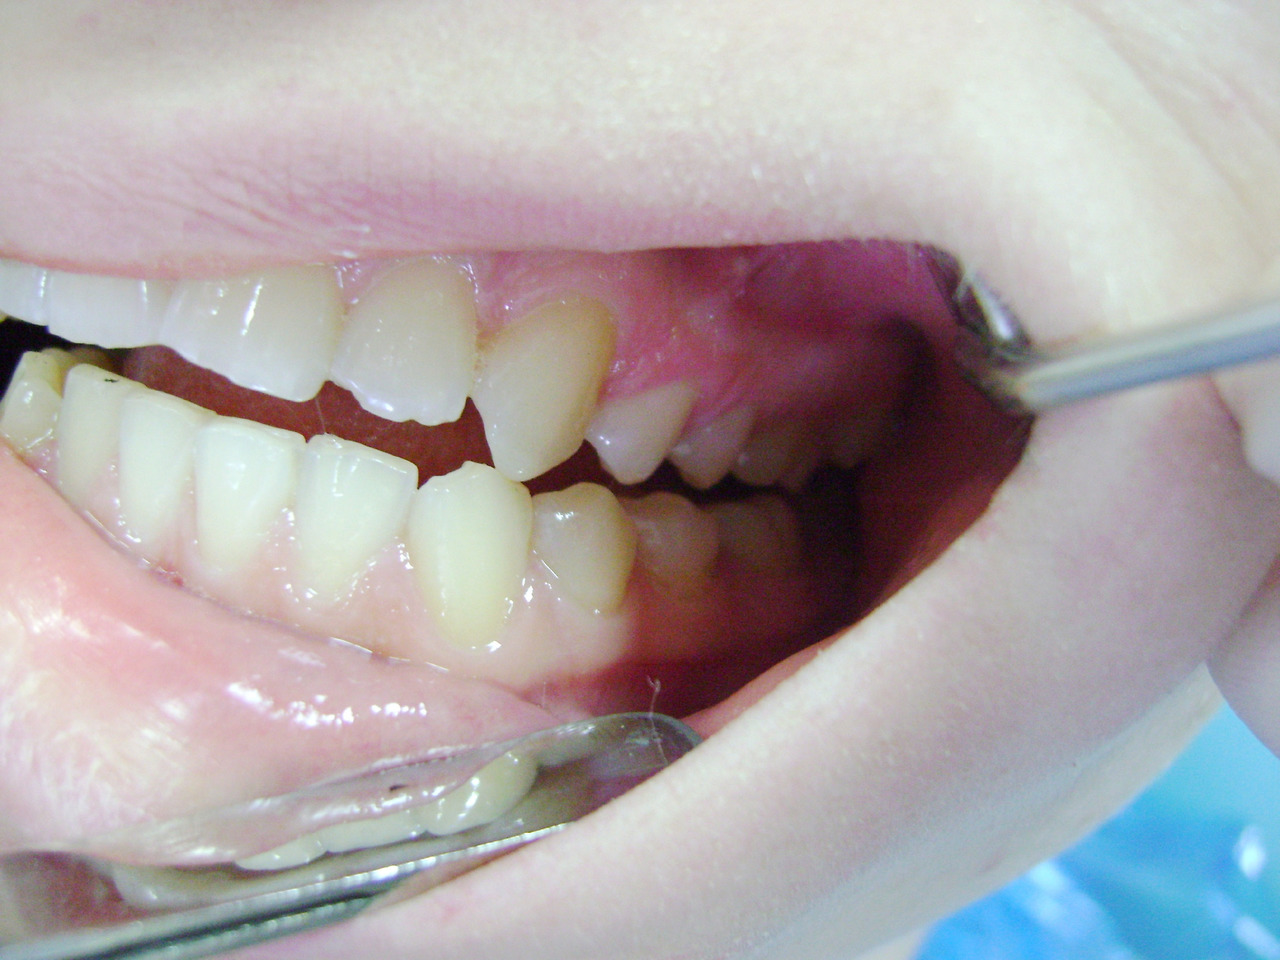 Рис. 5г. Левая латеротрузия после лечения.